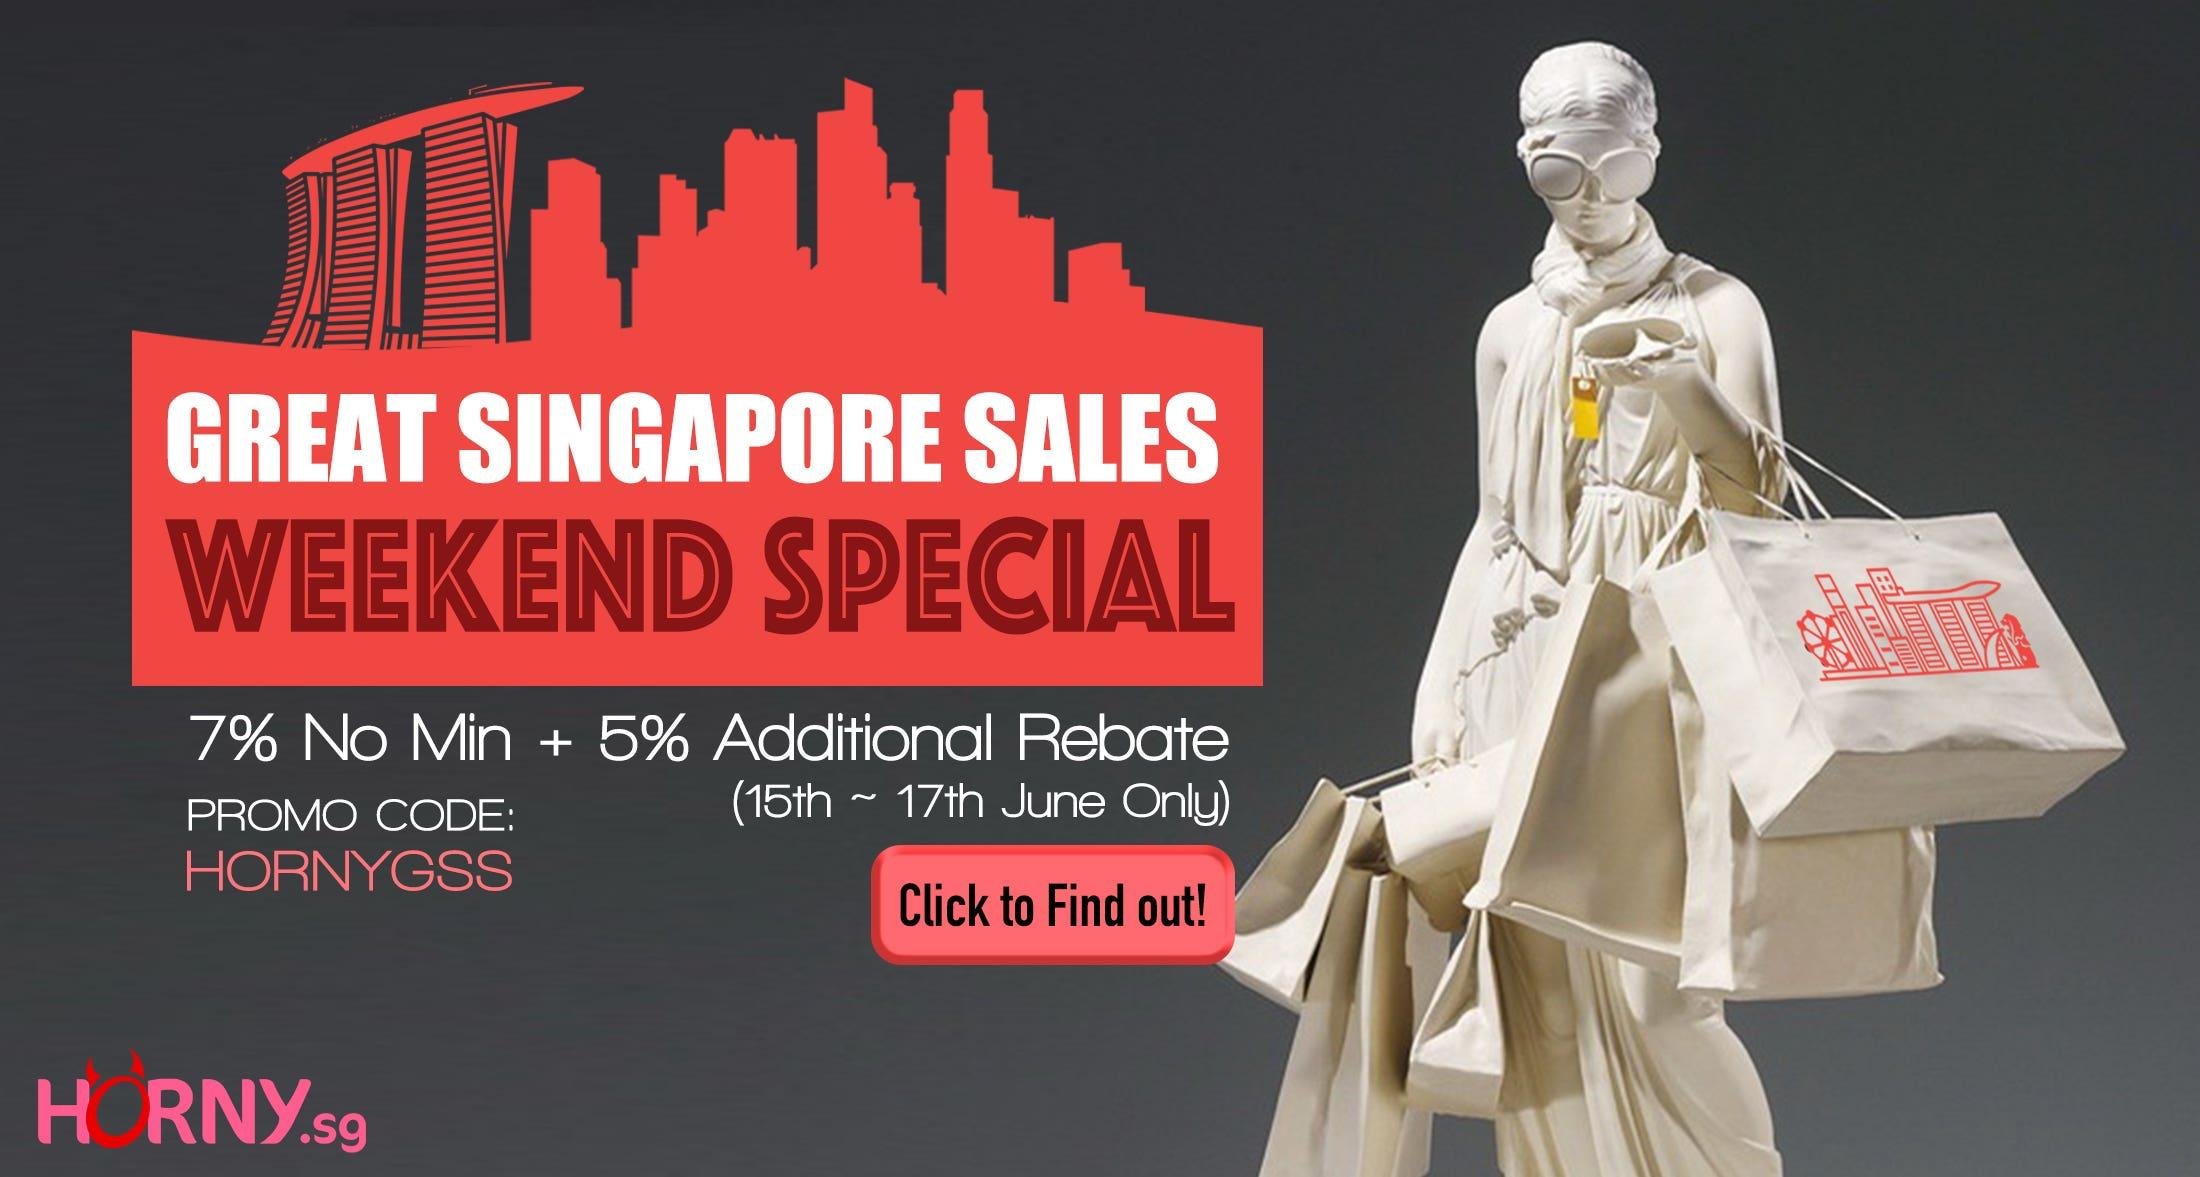 Great Singapore Sales 2018 7% Off No Min. + 5% Rebate